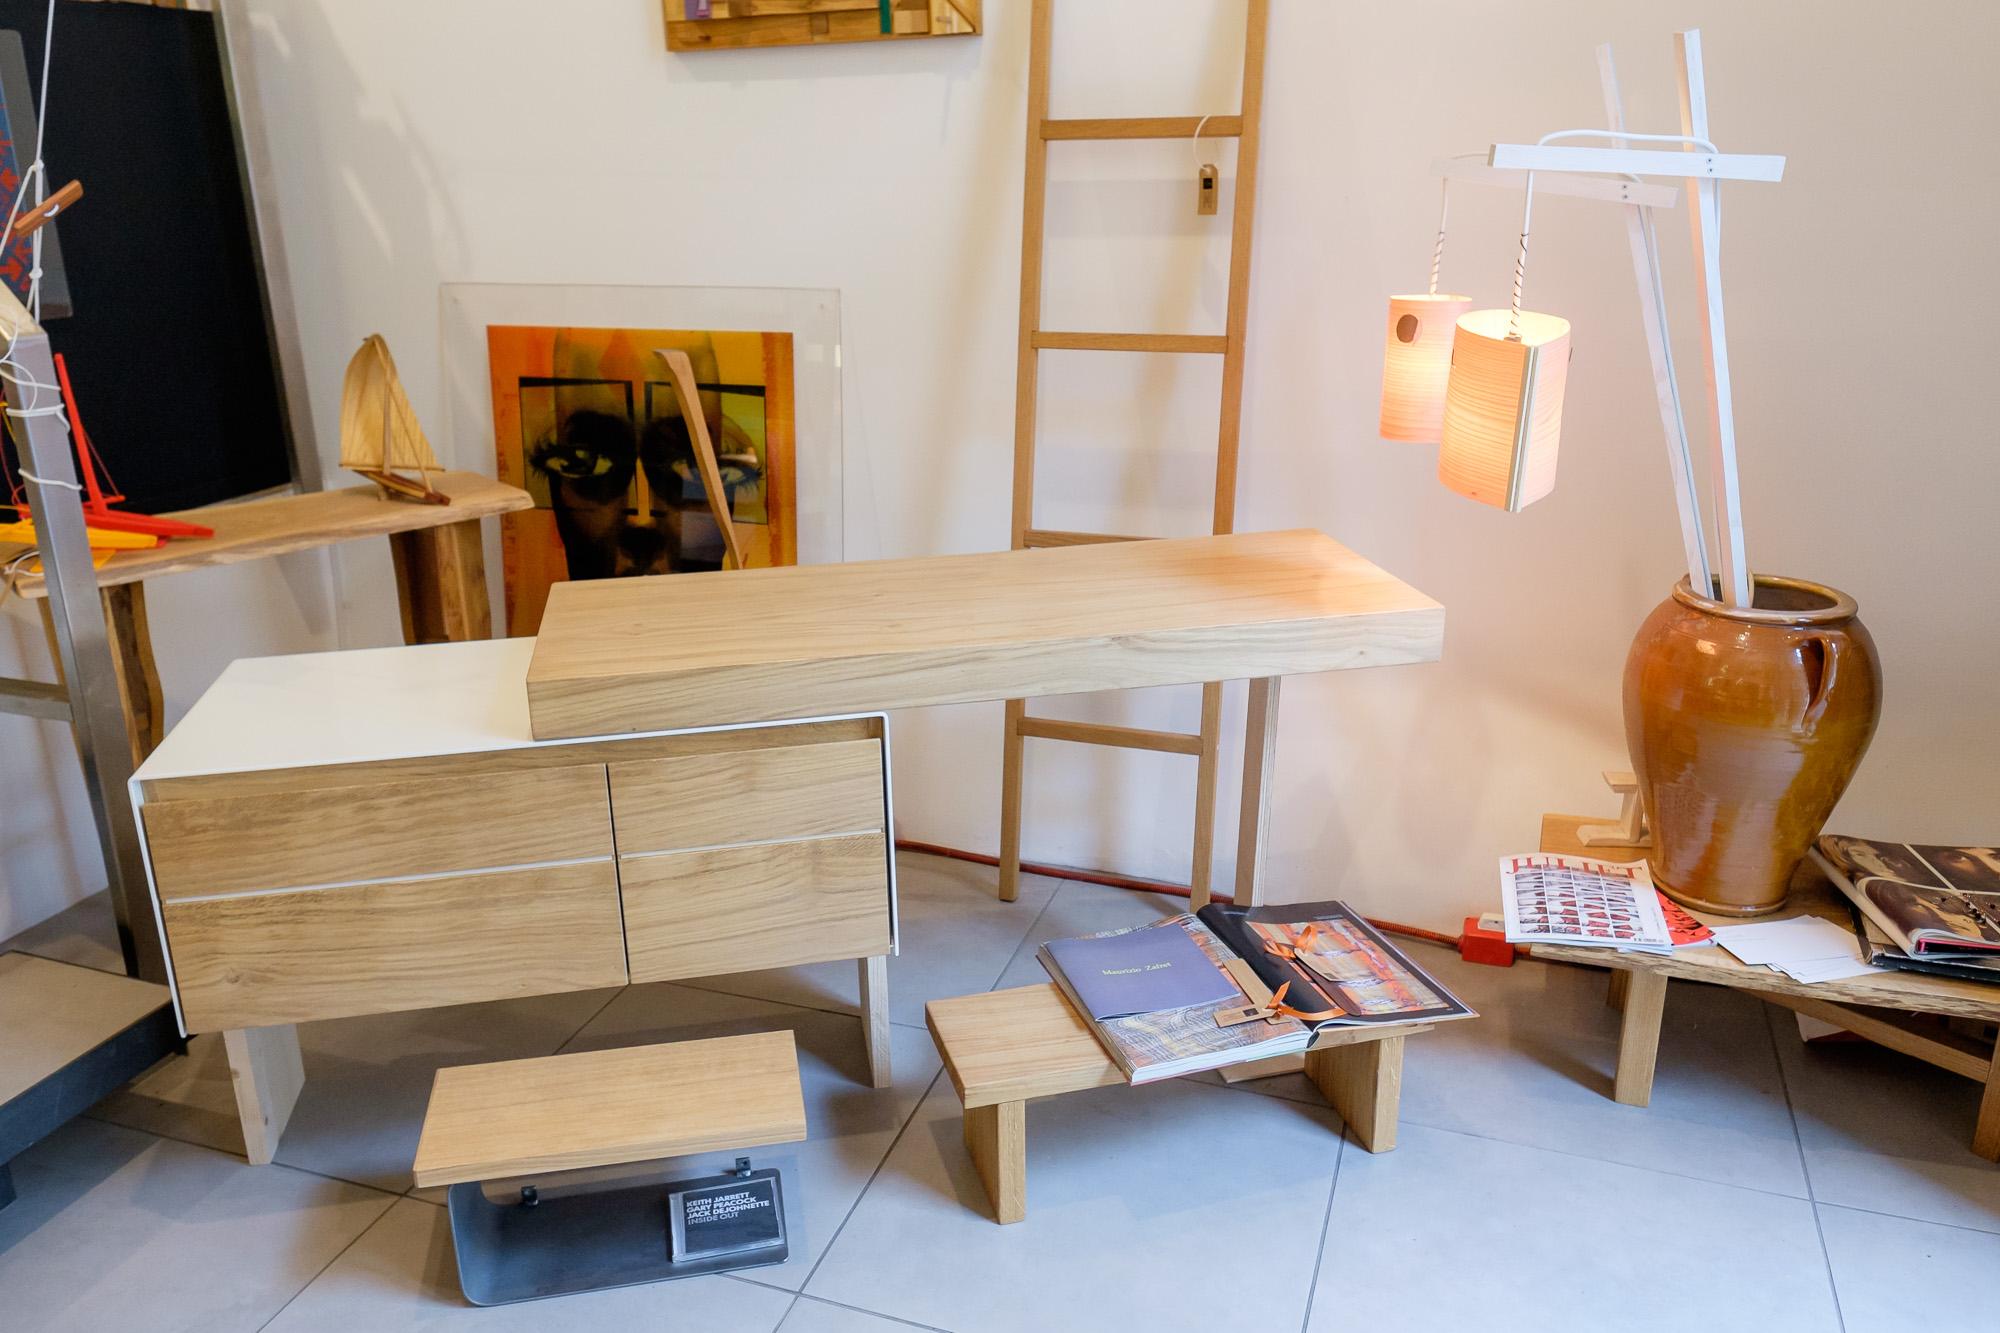 Negozi mobili trieste interesting di design elisir arredo for Negozi online design